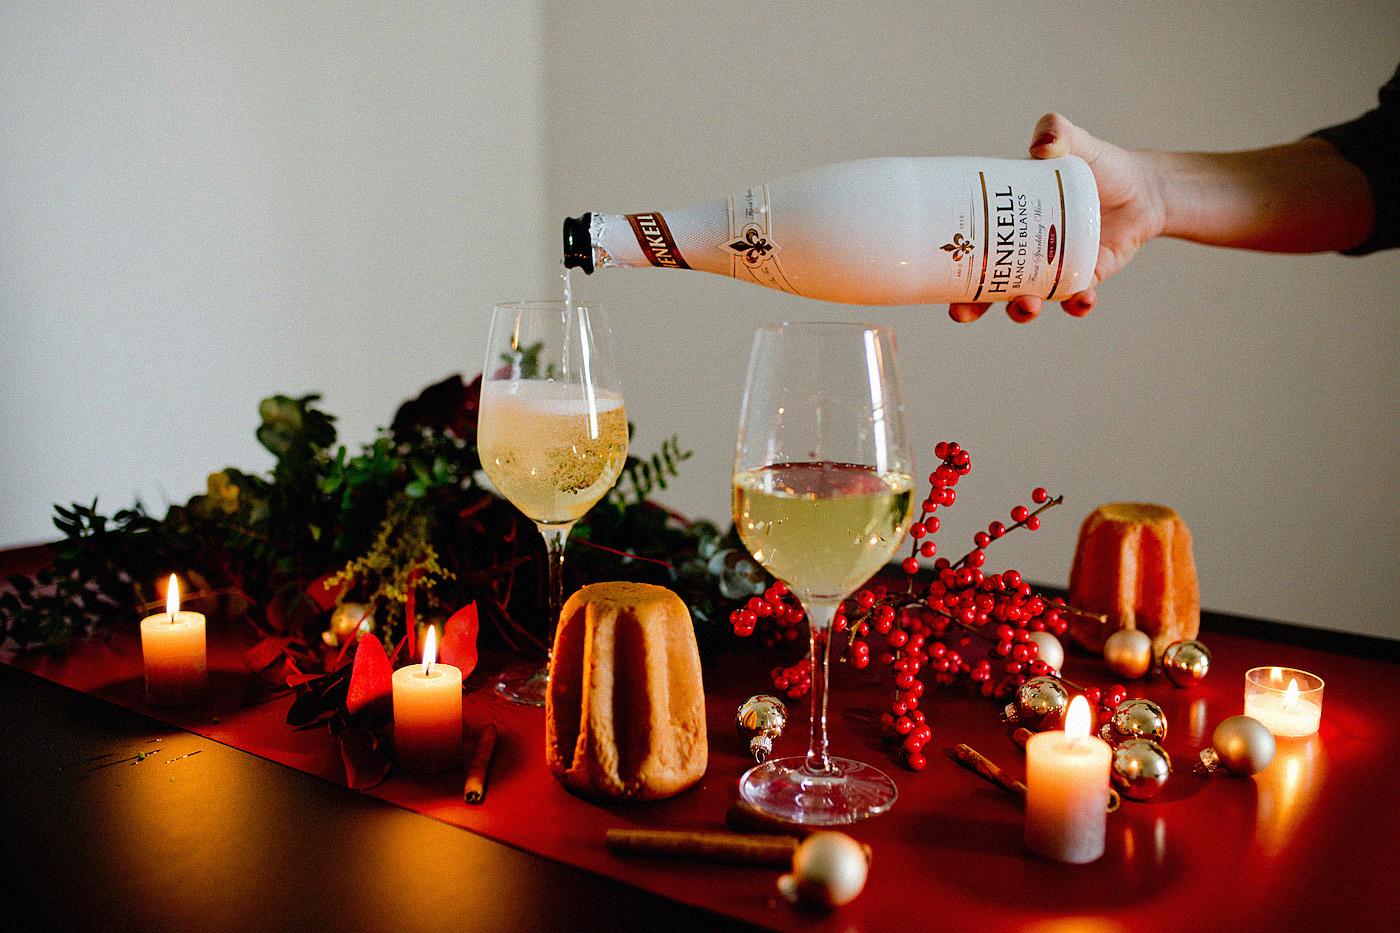 Saturday sparkle with Henkell –Kollwitzmarkt & Bubbles